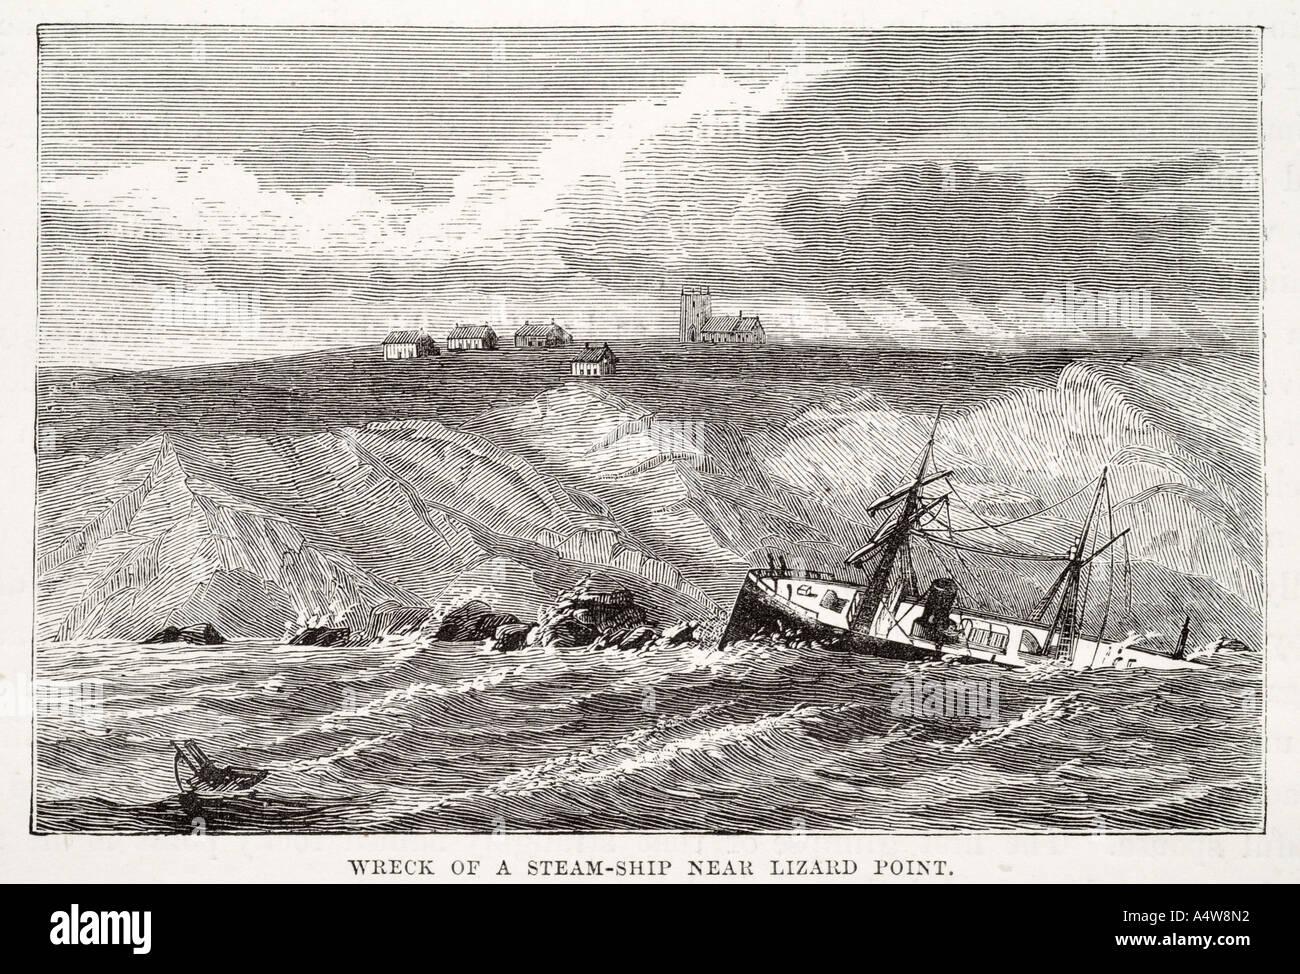 wreck steam ship lizard point storm wave cliff shore smash peril sail founder crash break broken rock coast shore lost wind sea - Stock Image